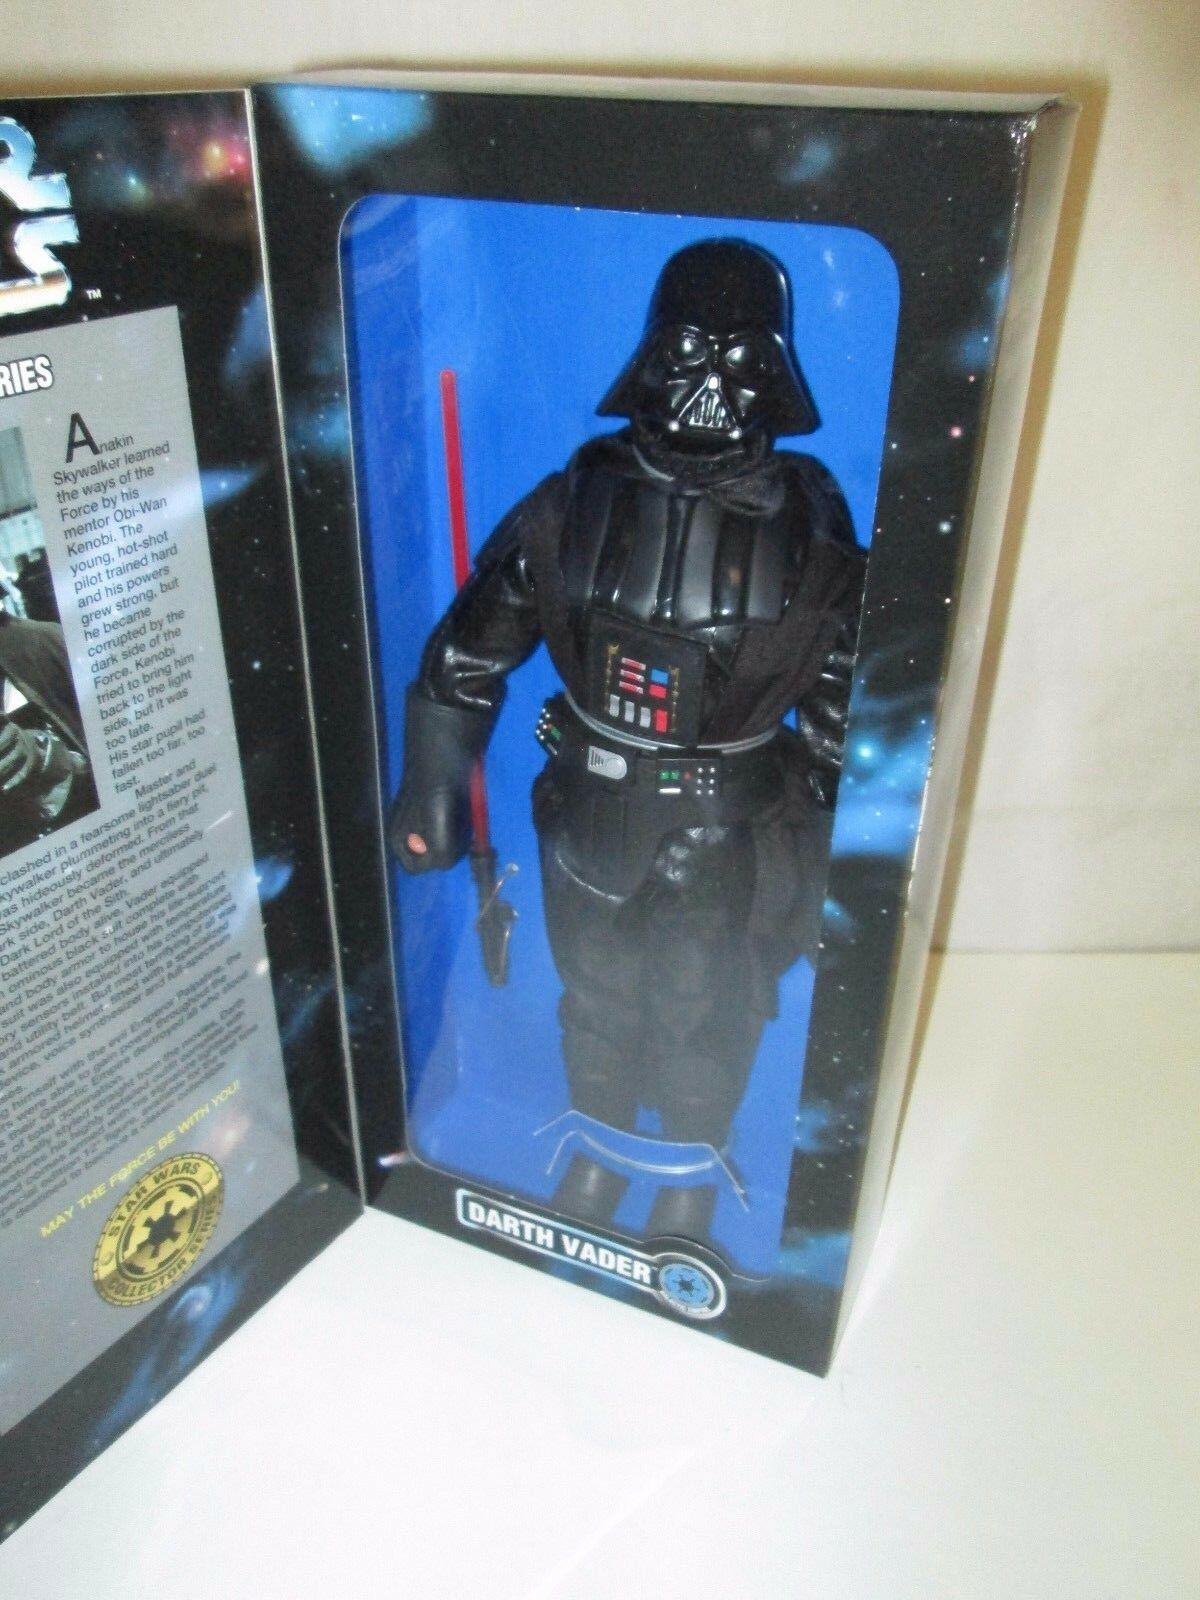 Star Wars Darth Vader Collector Series 12